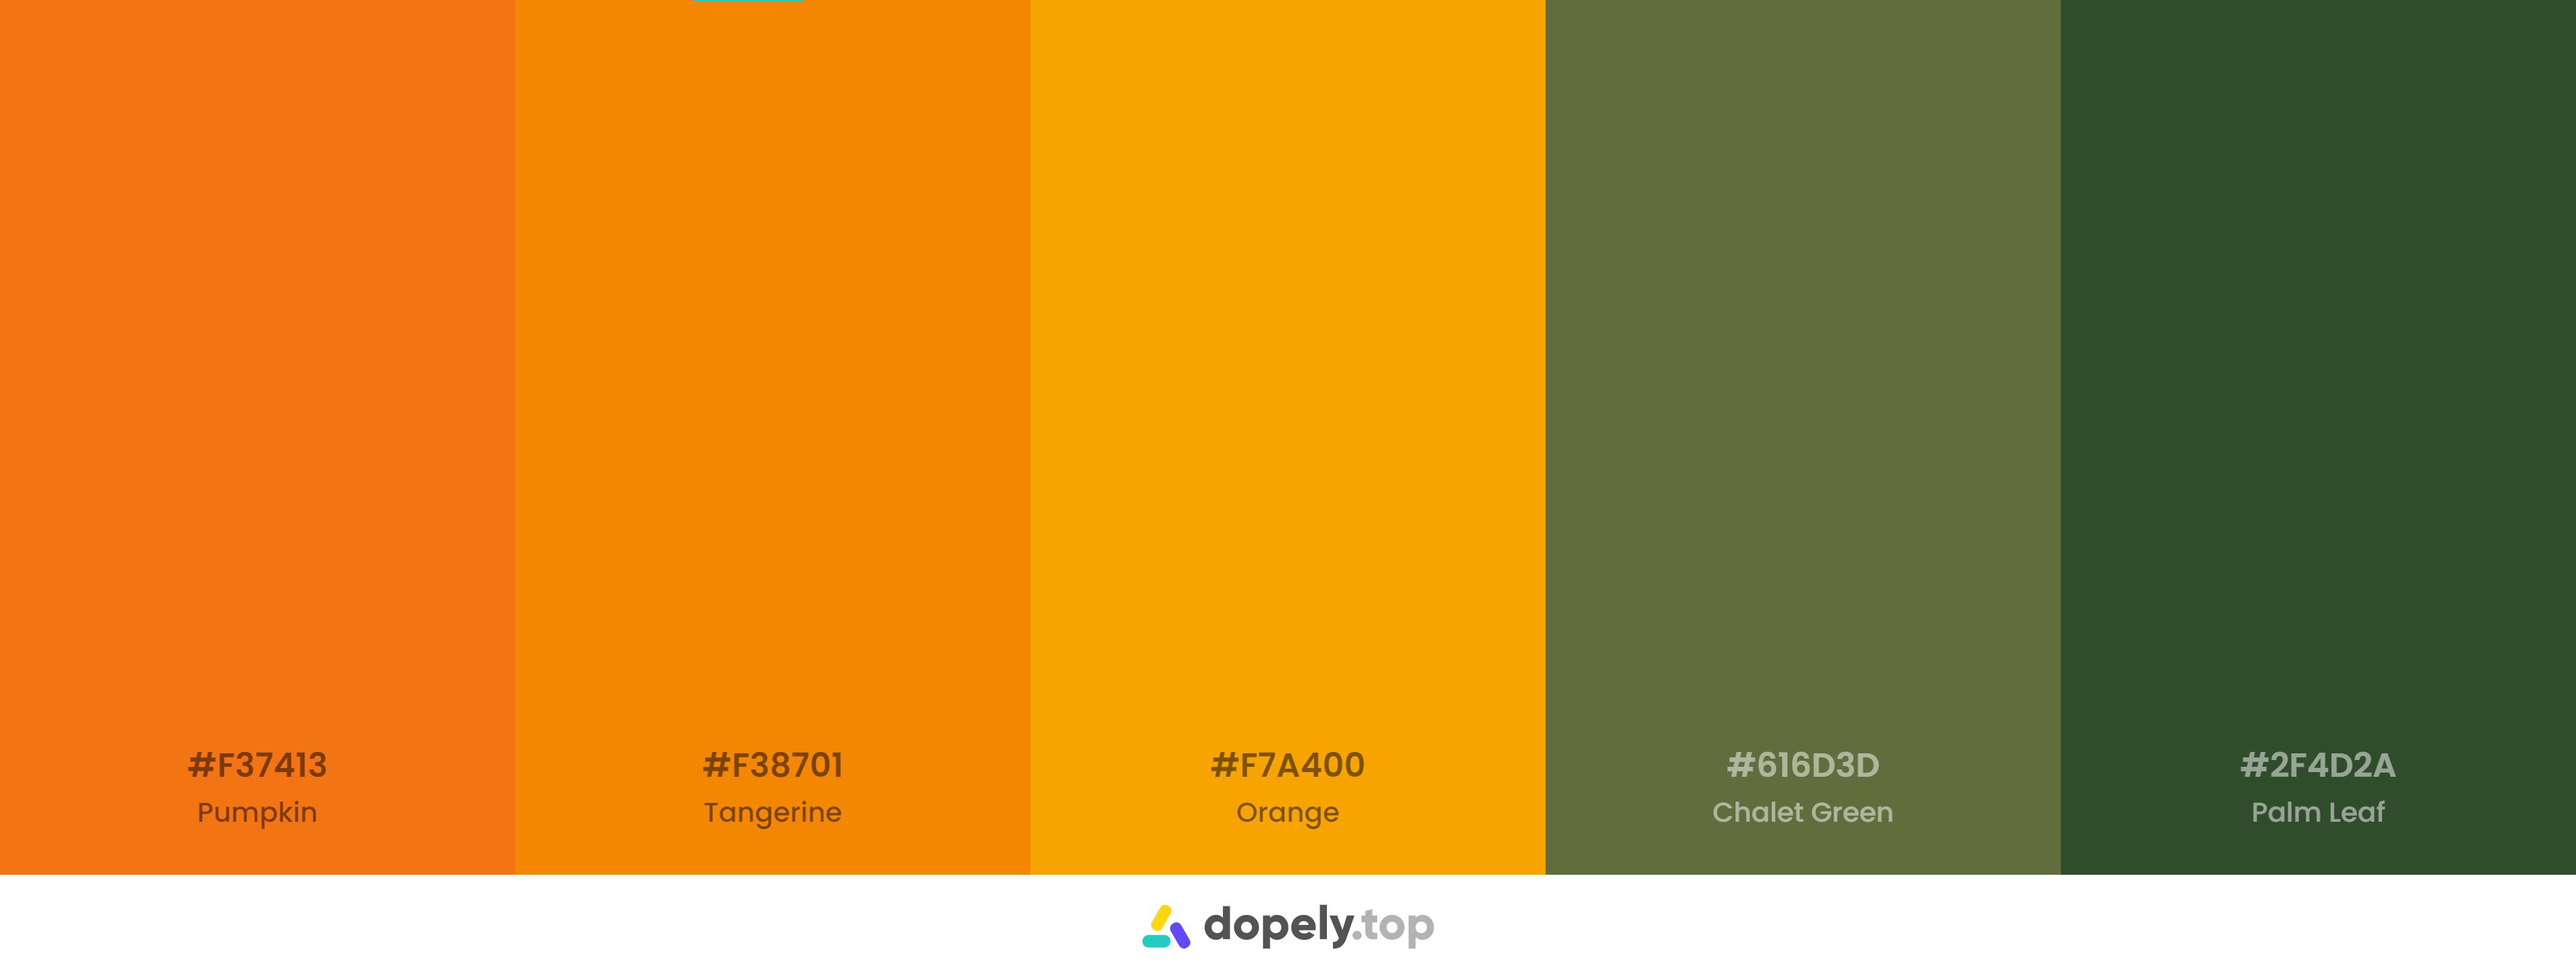 pumpkin, orange, tangerine in a color scheme